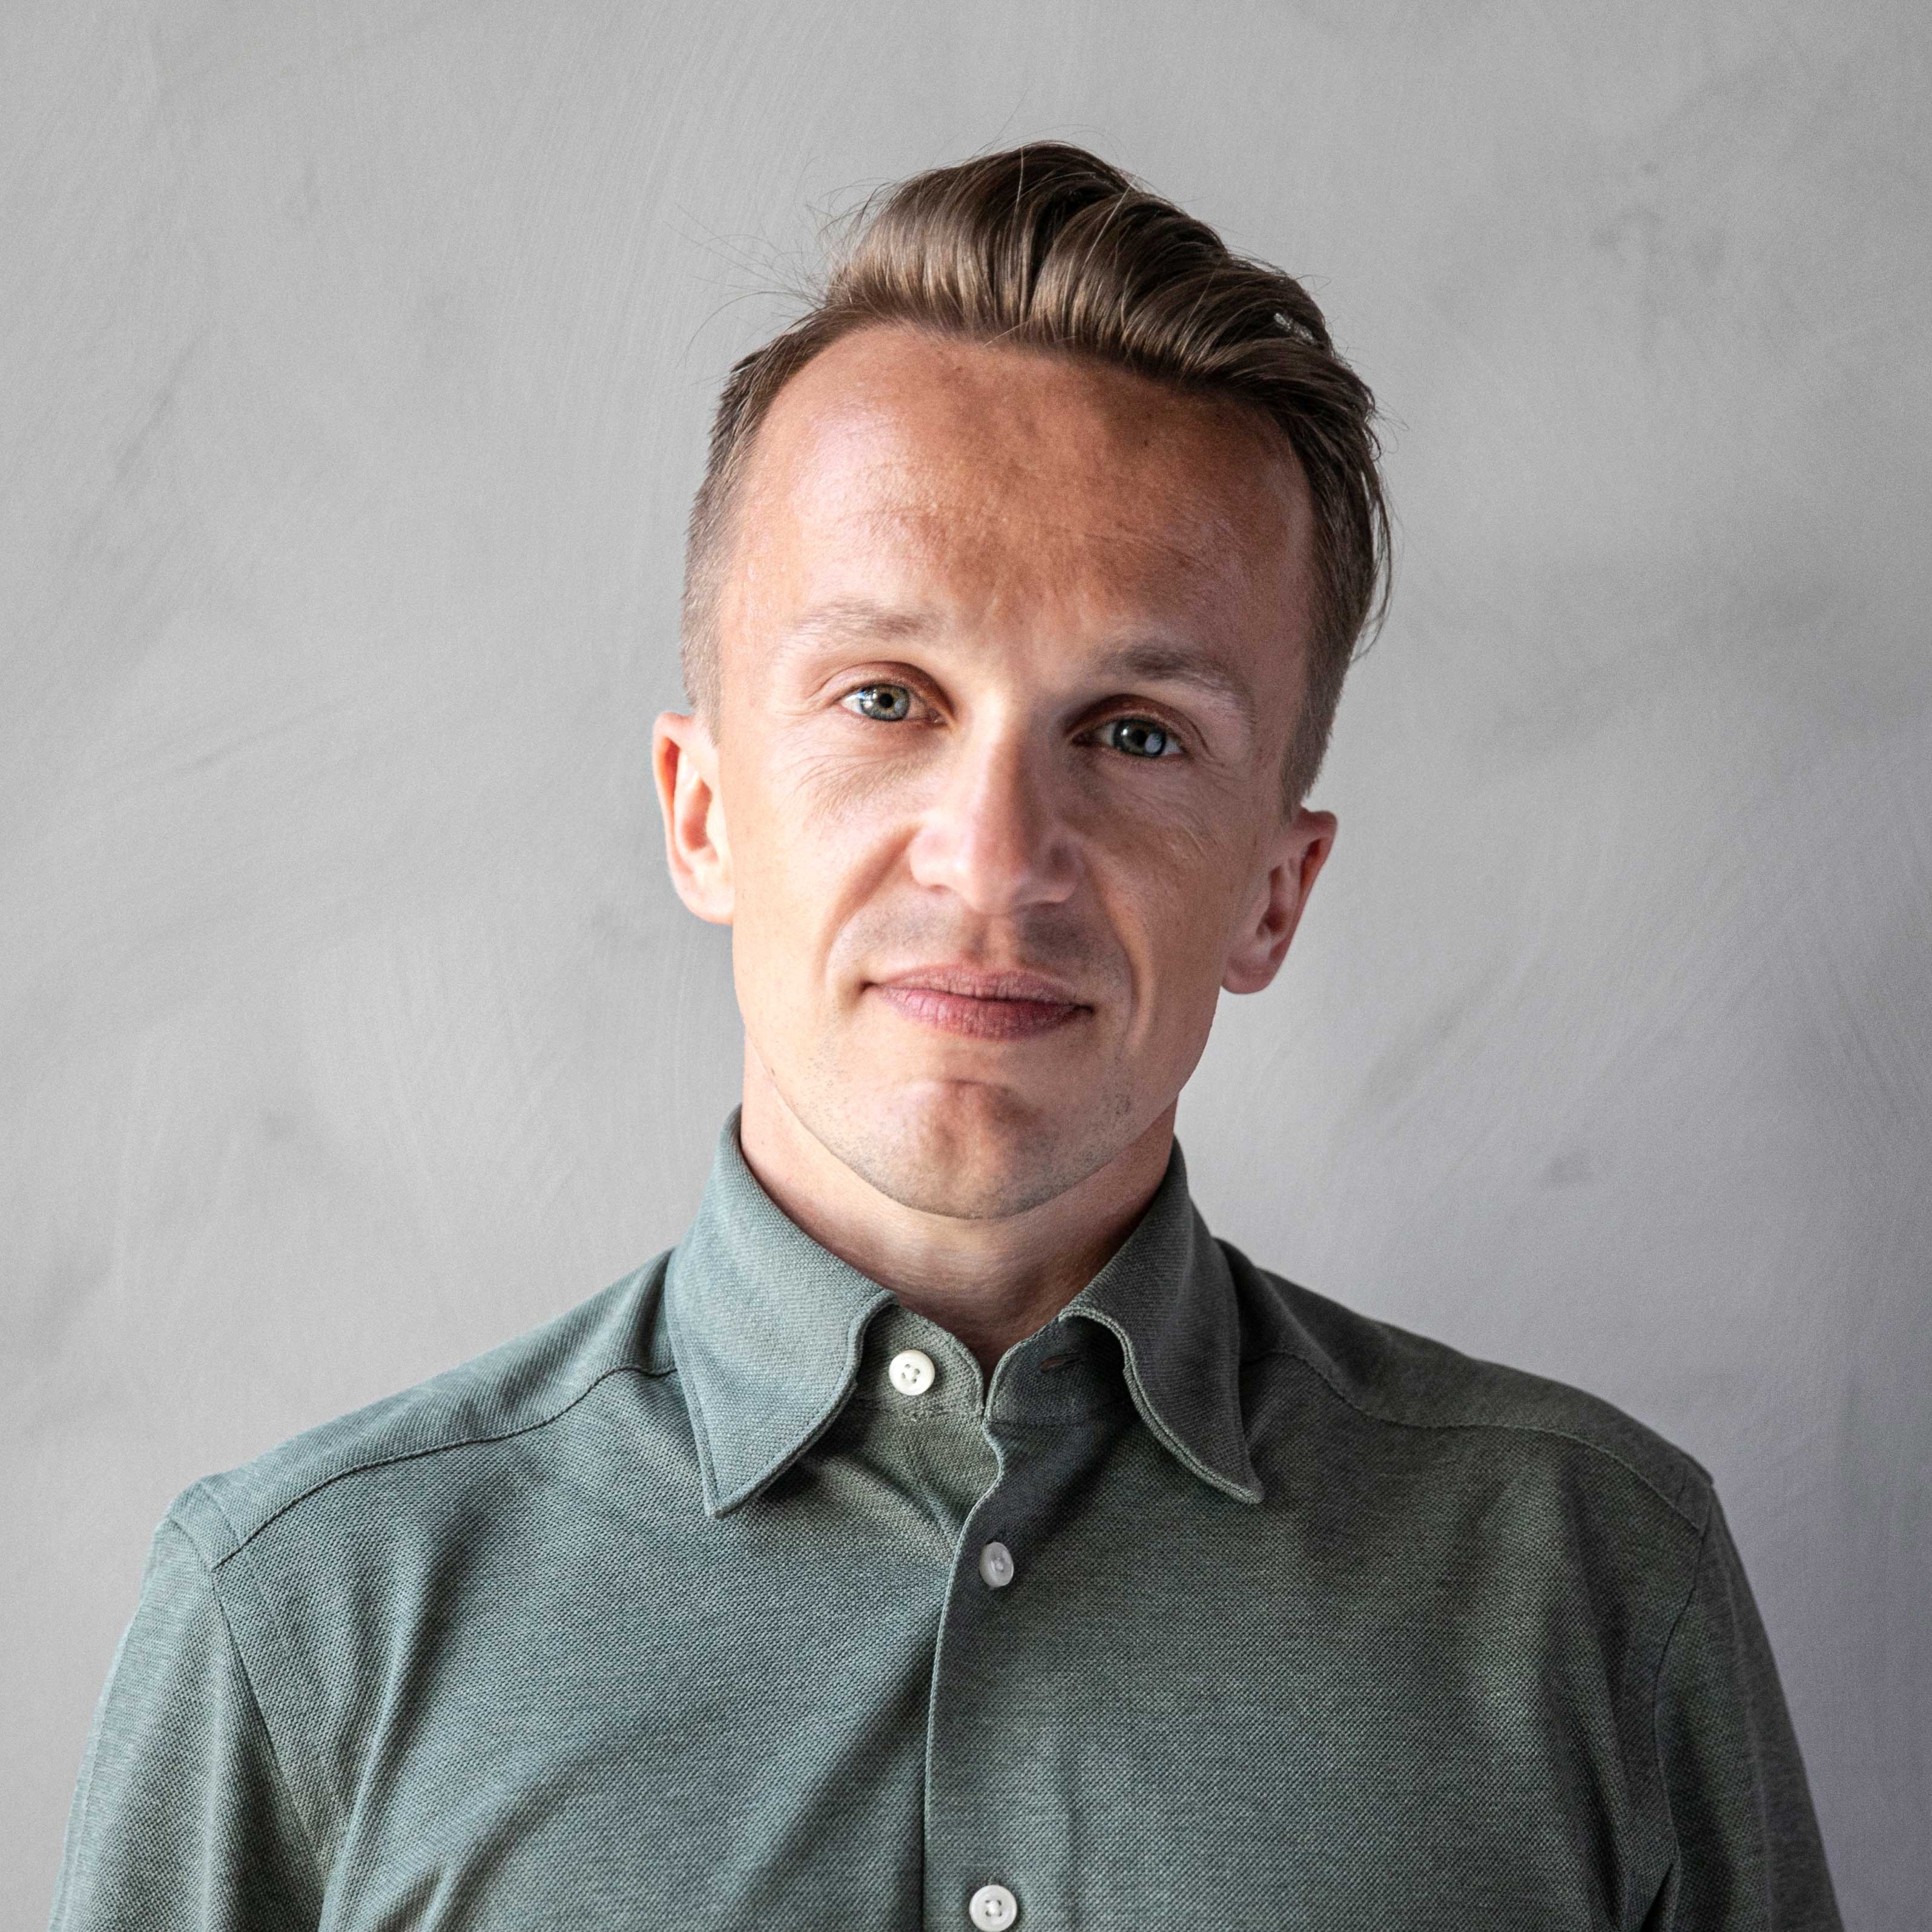 Ole Henrik Kråkenes